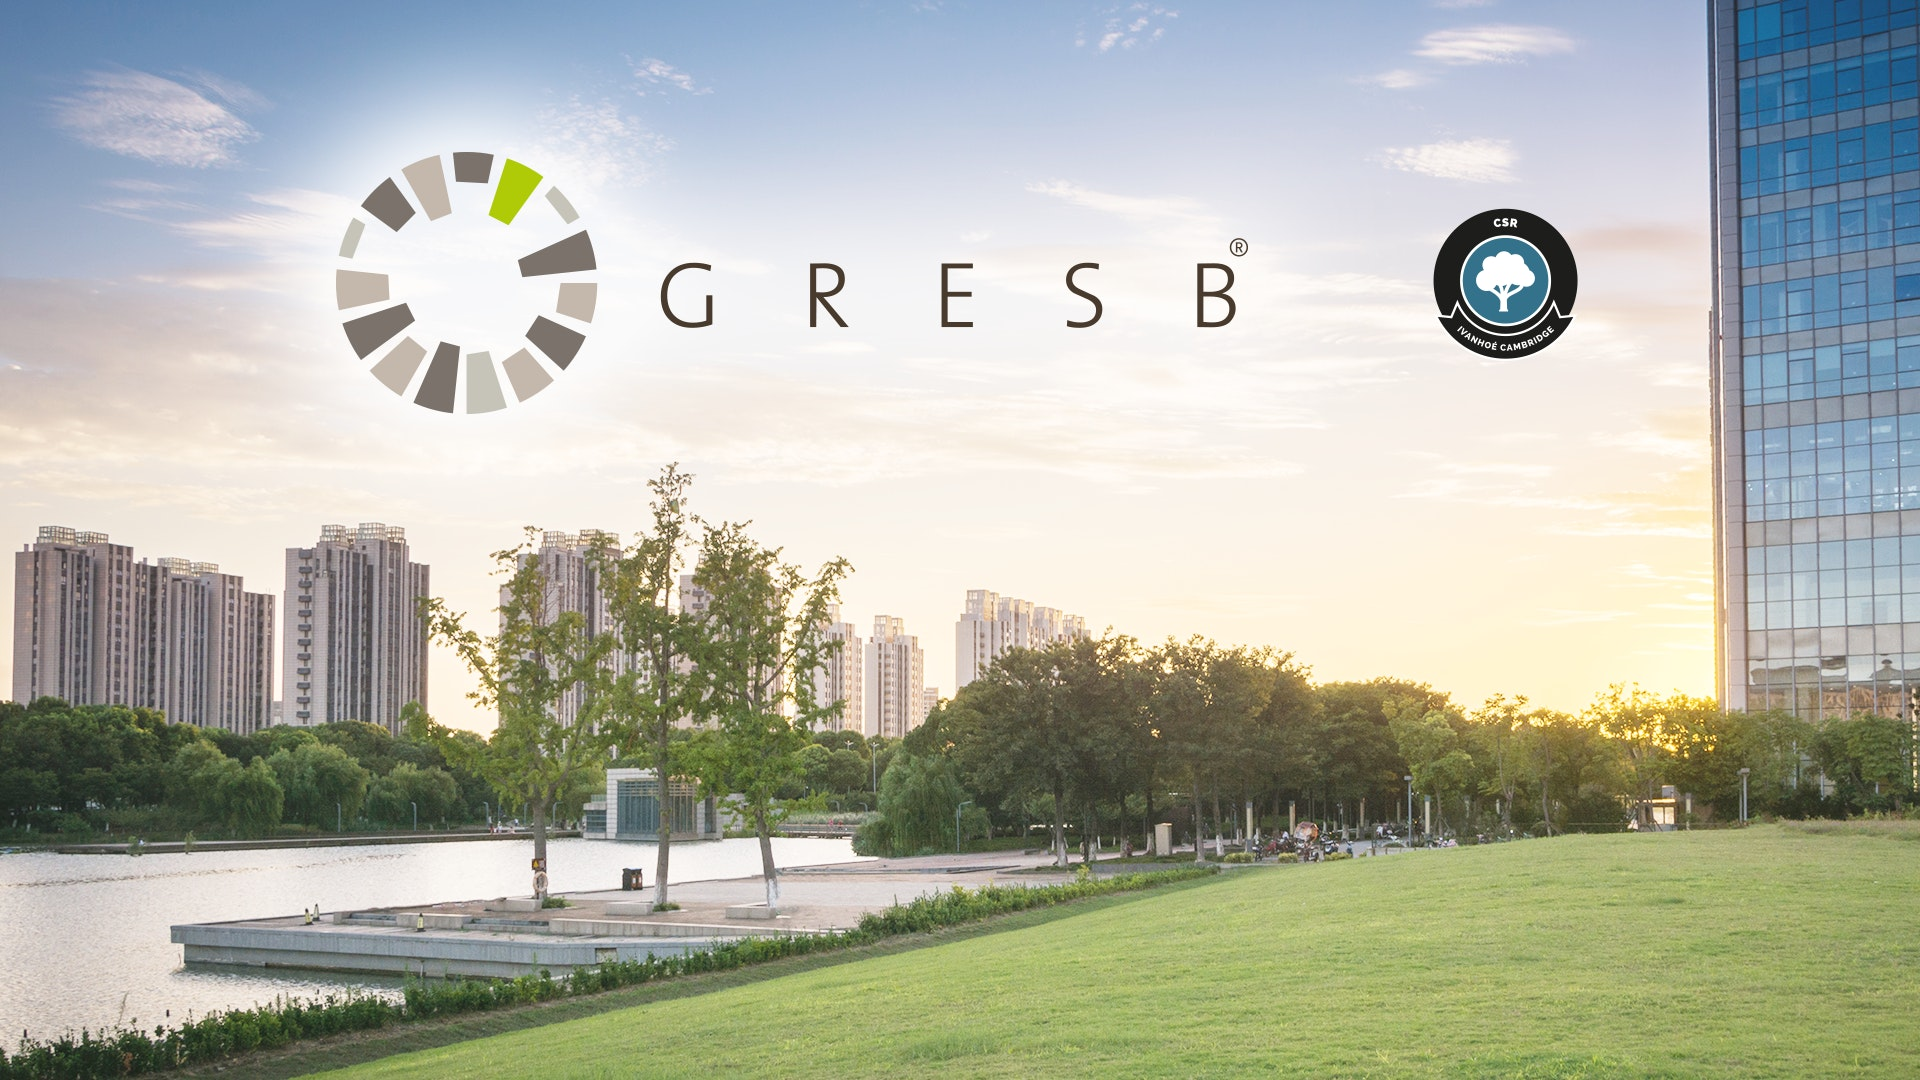 GRESB 2020